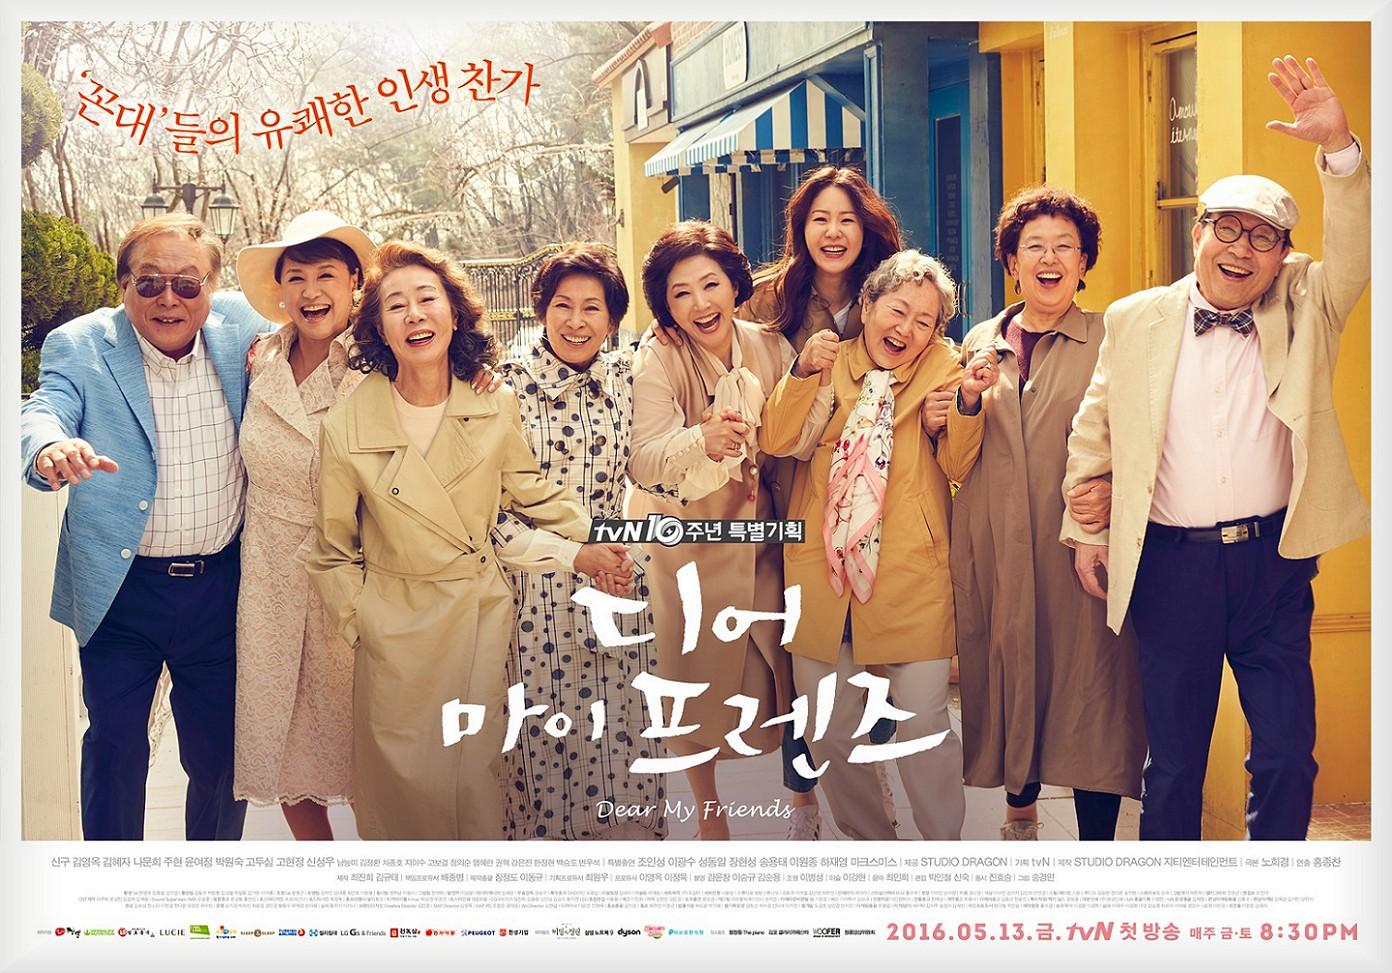 Friend korean mothers Friend (2001